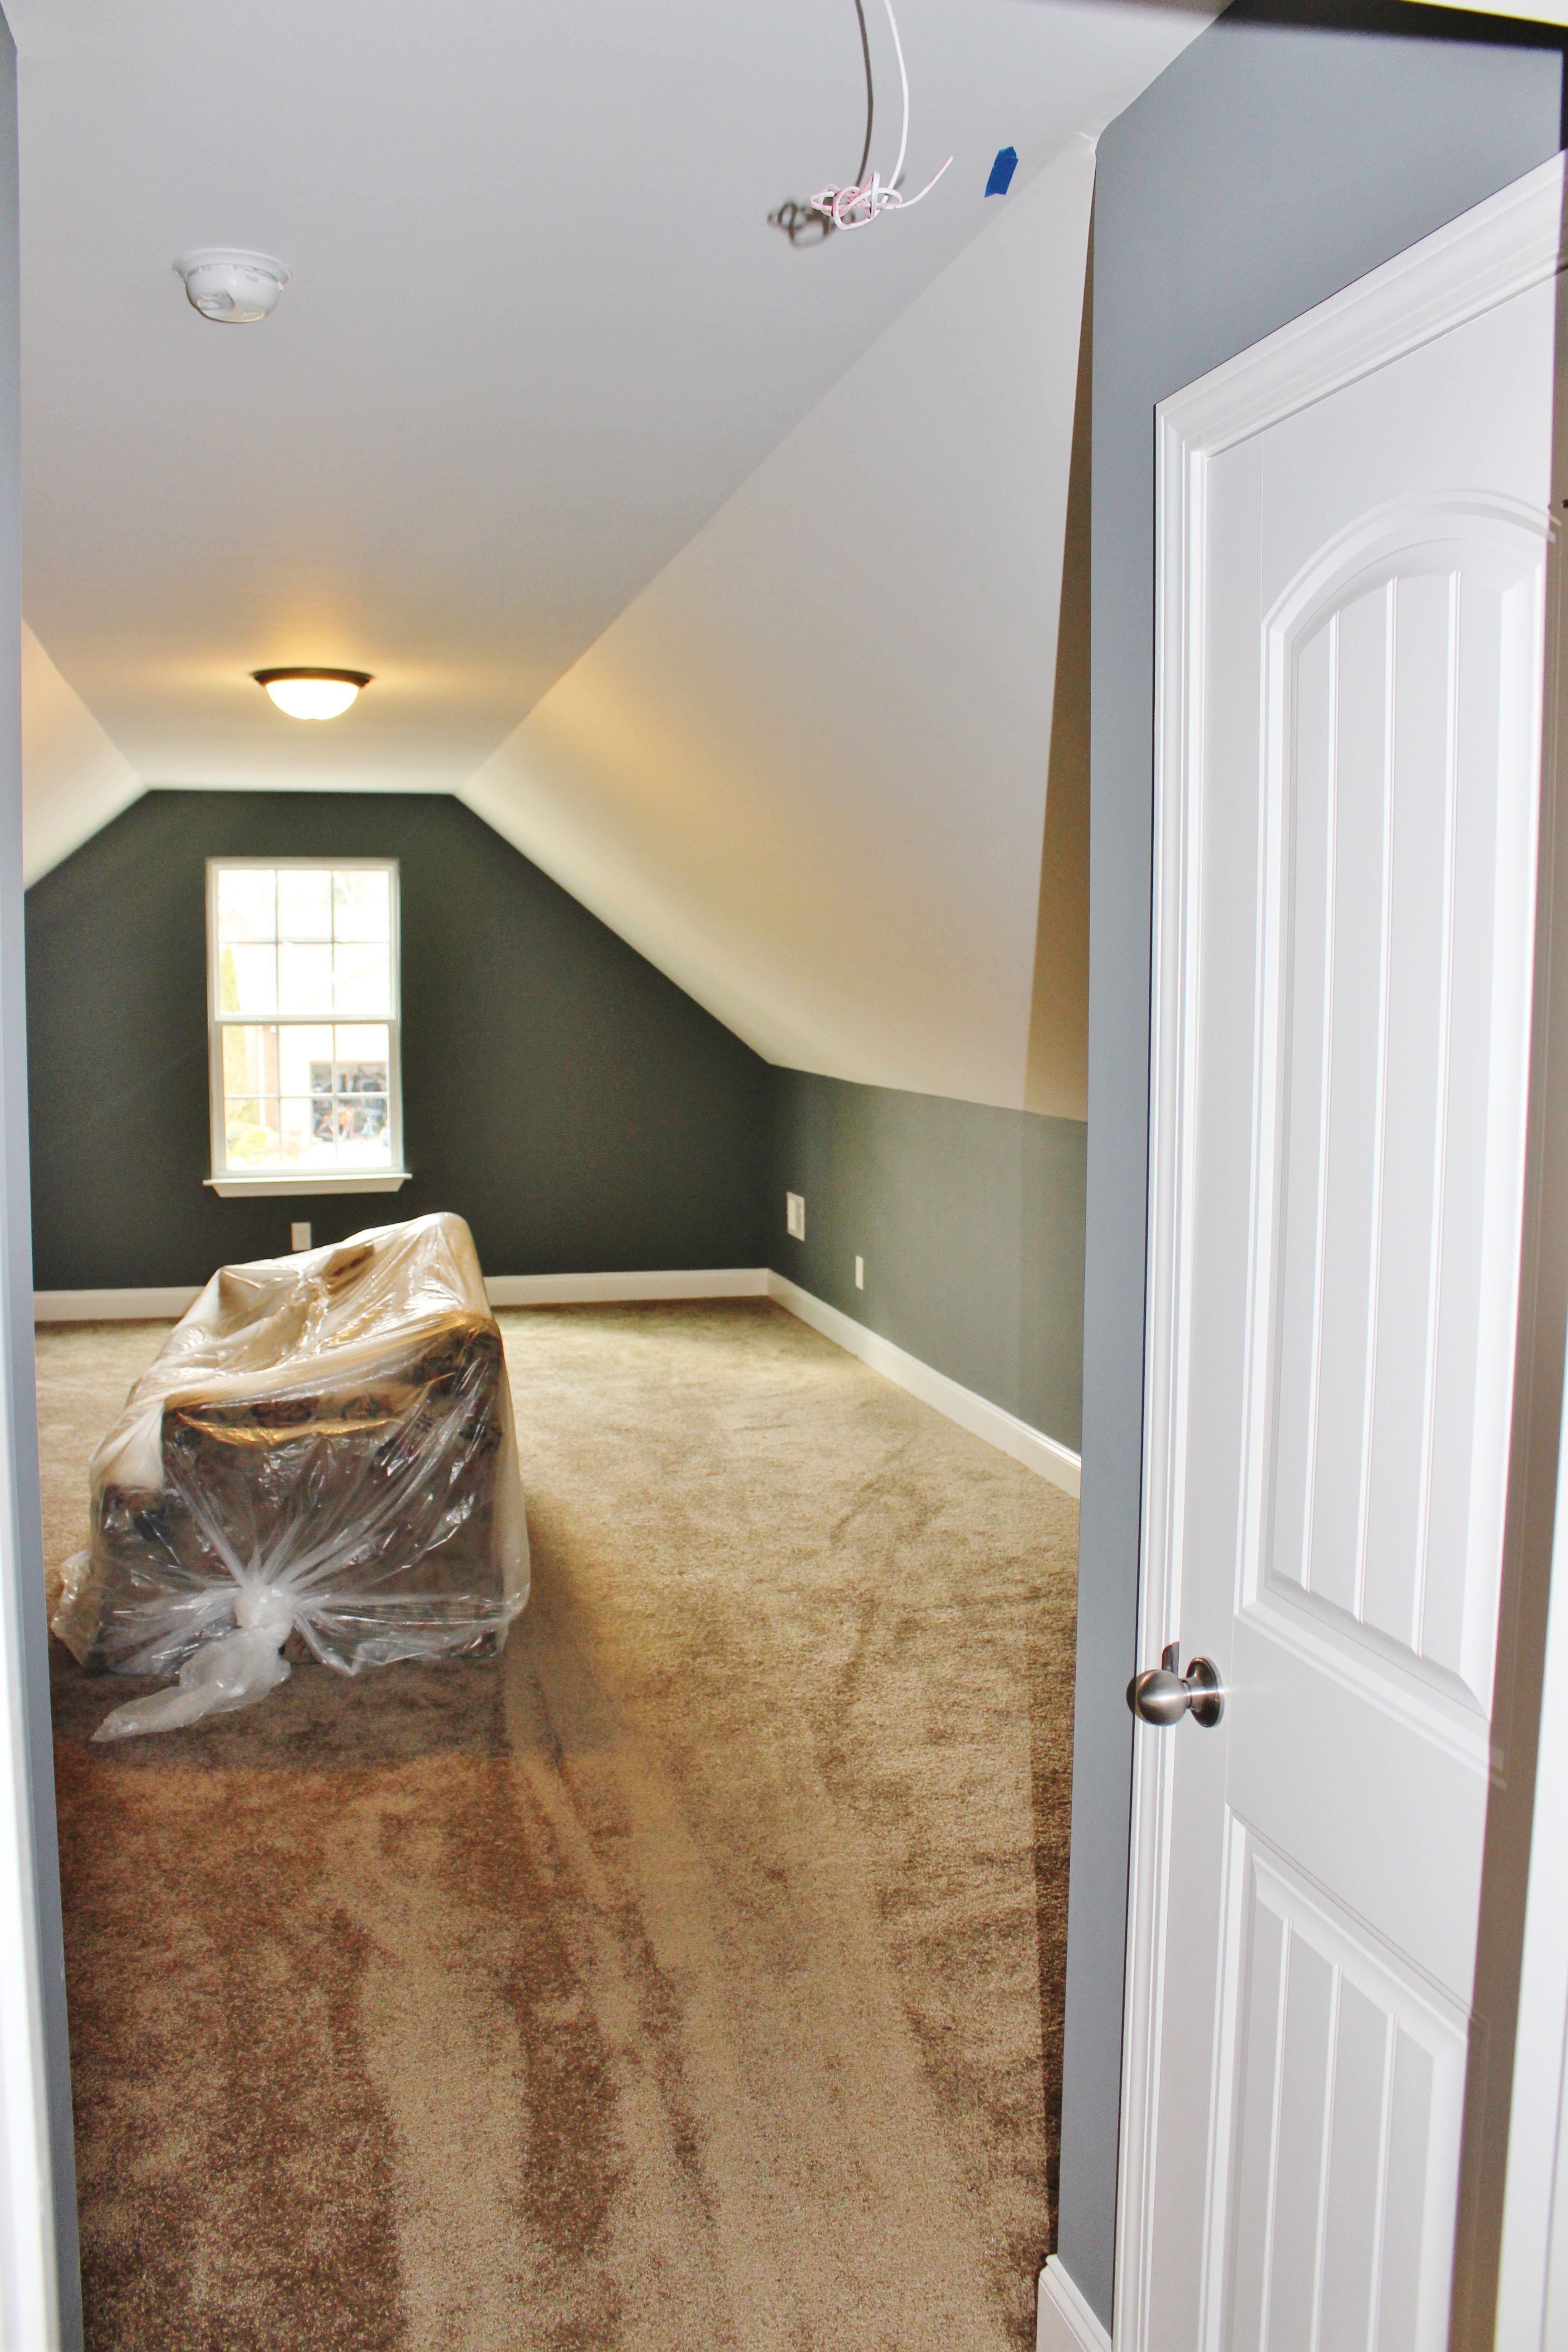 Bonus Room Ideas Above Garage Bonusroomdecoratingideaspictures Master Bedroom Remodel Remodel Bedroom Small Bedroom Remodel